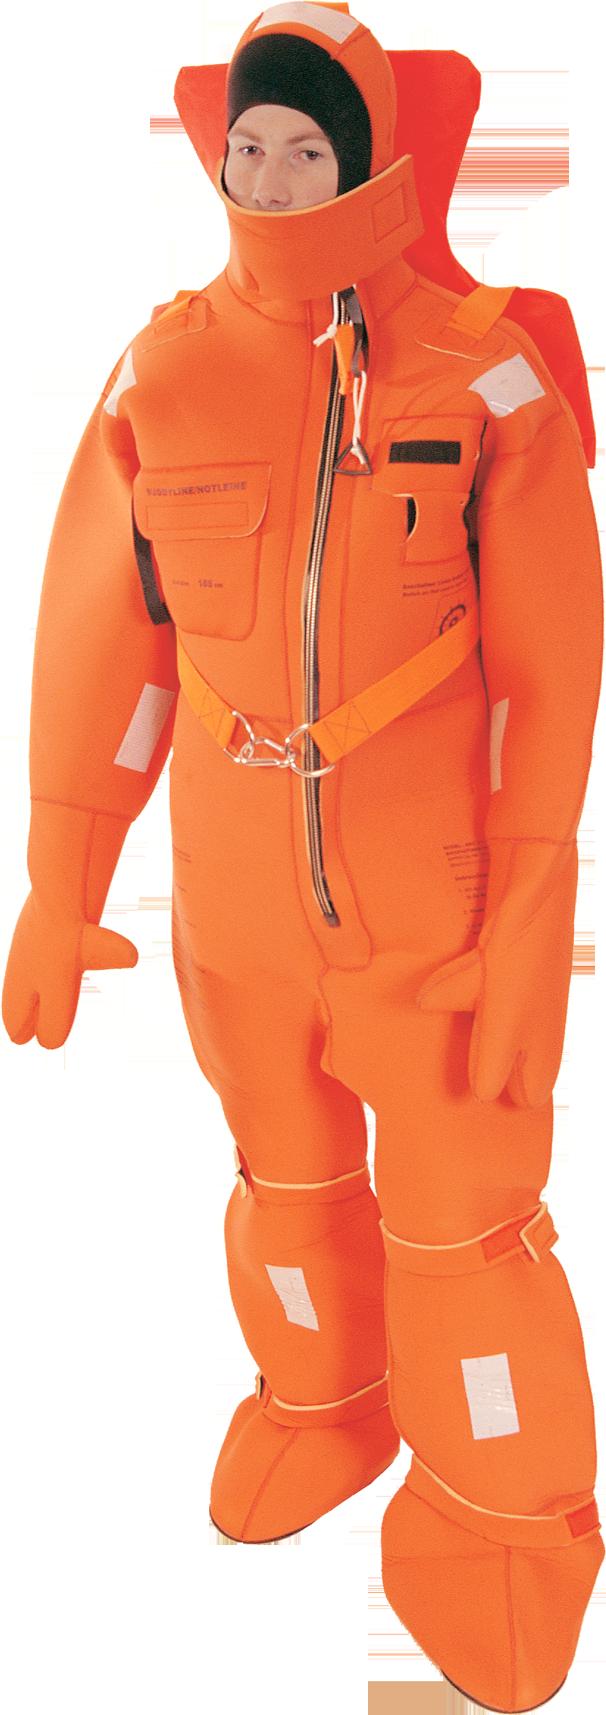 Rettungsanzug, Schutzanzug  Überlebensanzug Solas 6 Stunden     Arctic Version    Modell V40